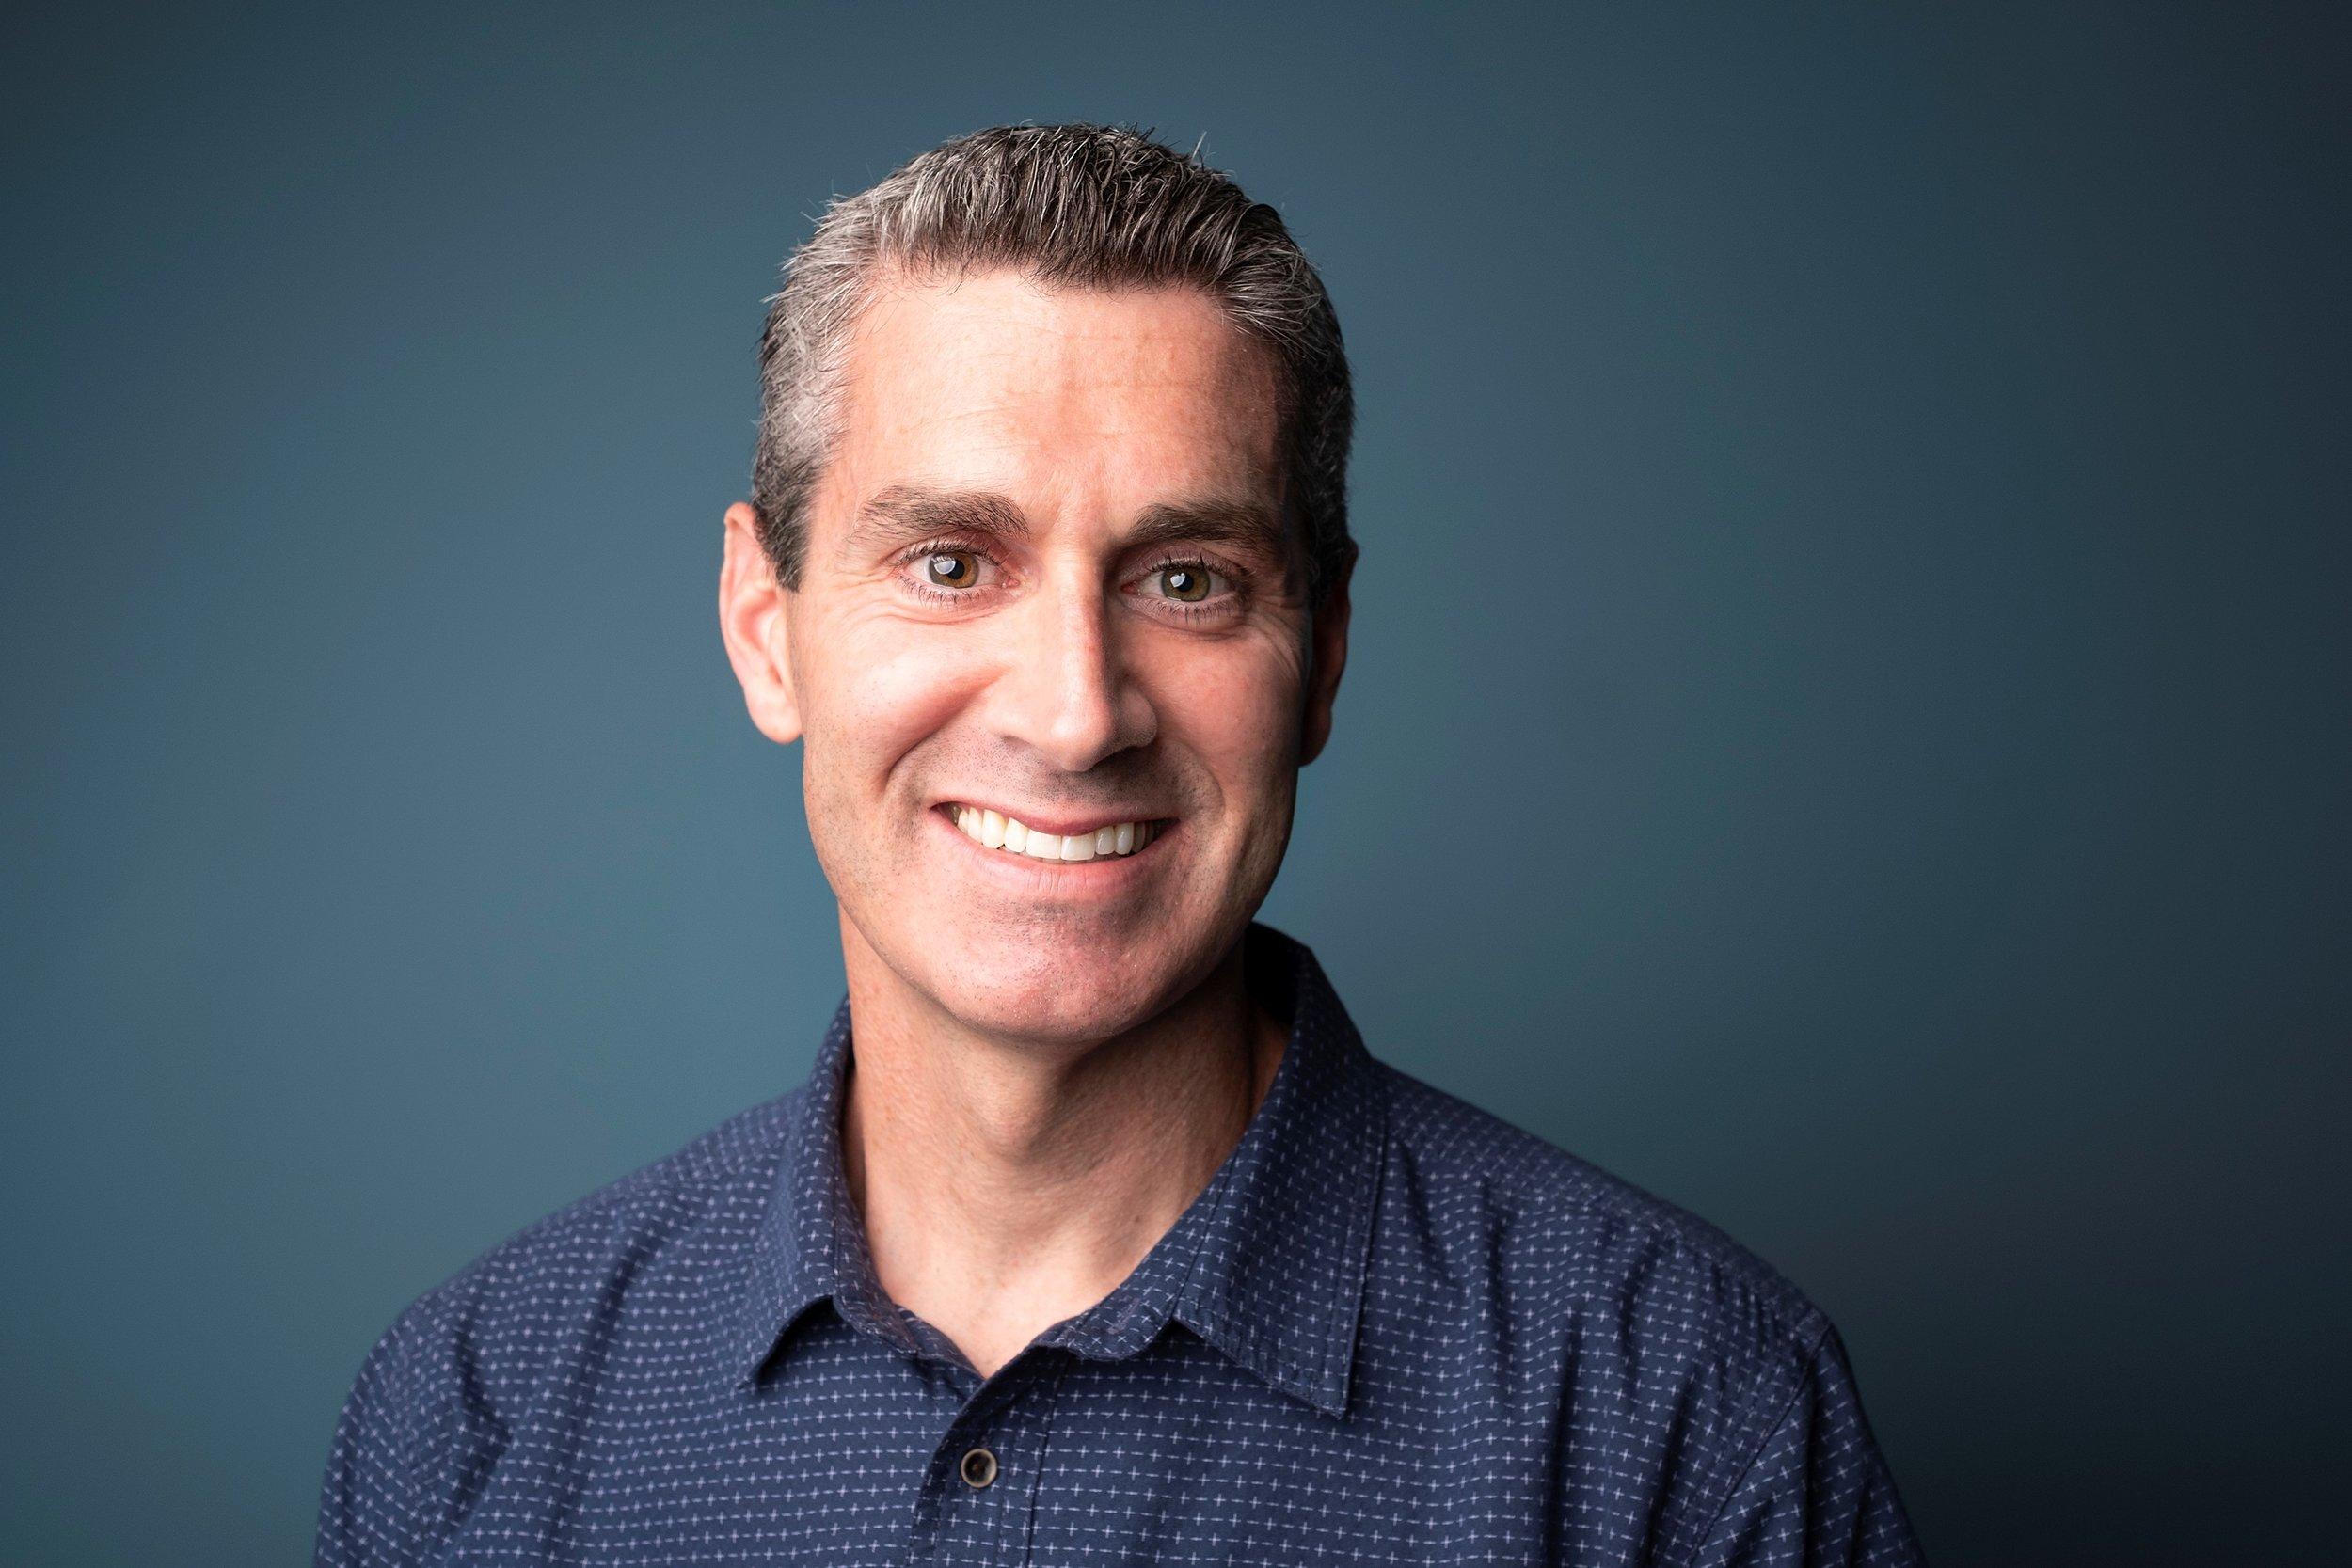 Jim McDonald, Director of Business Development